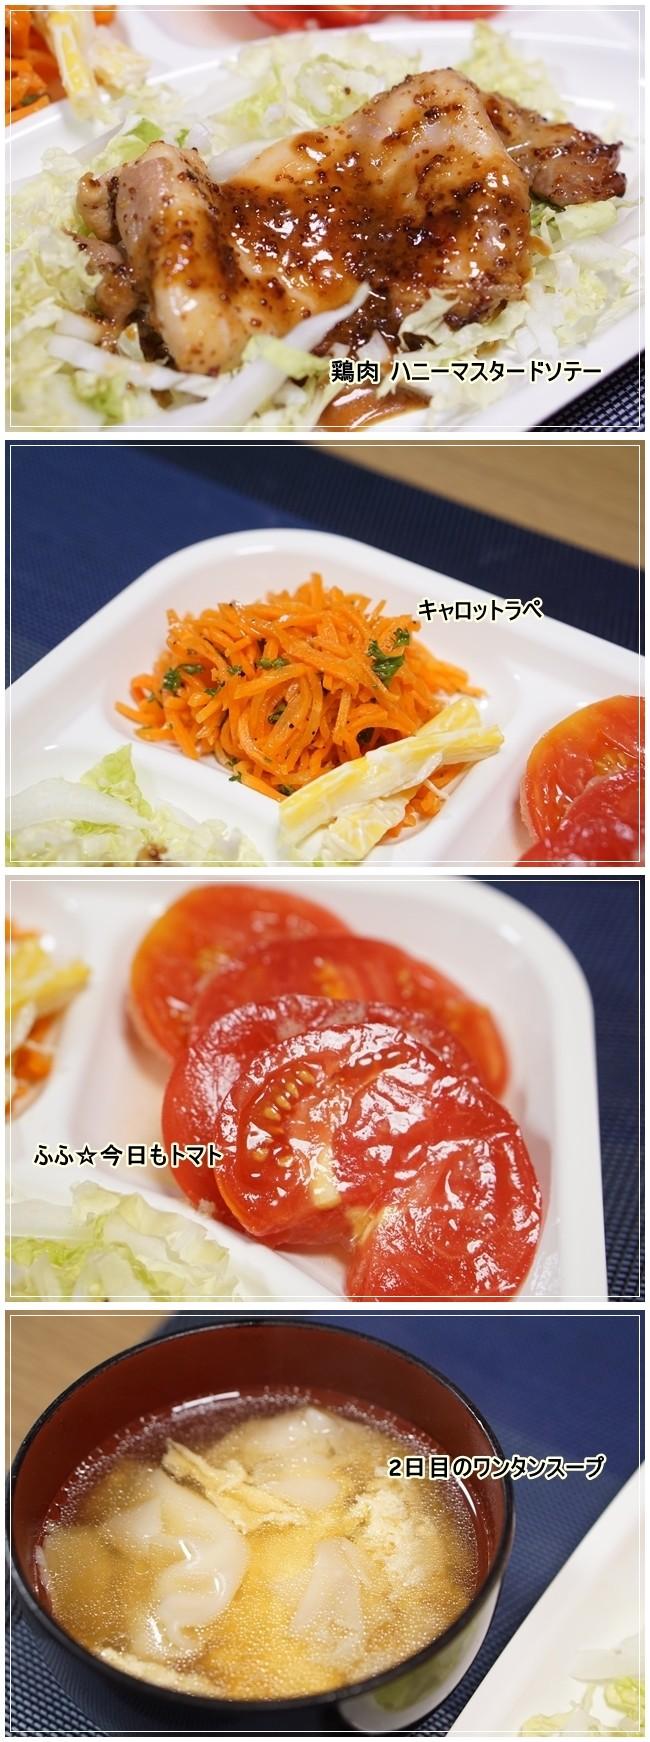 ■DSC03761-vert